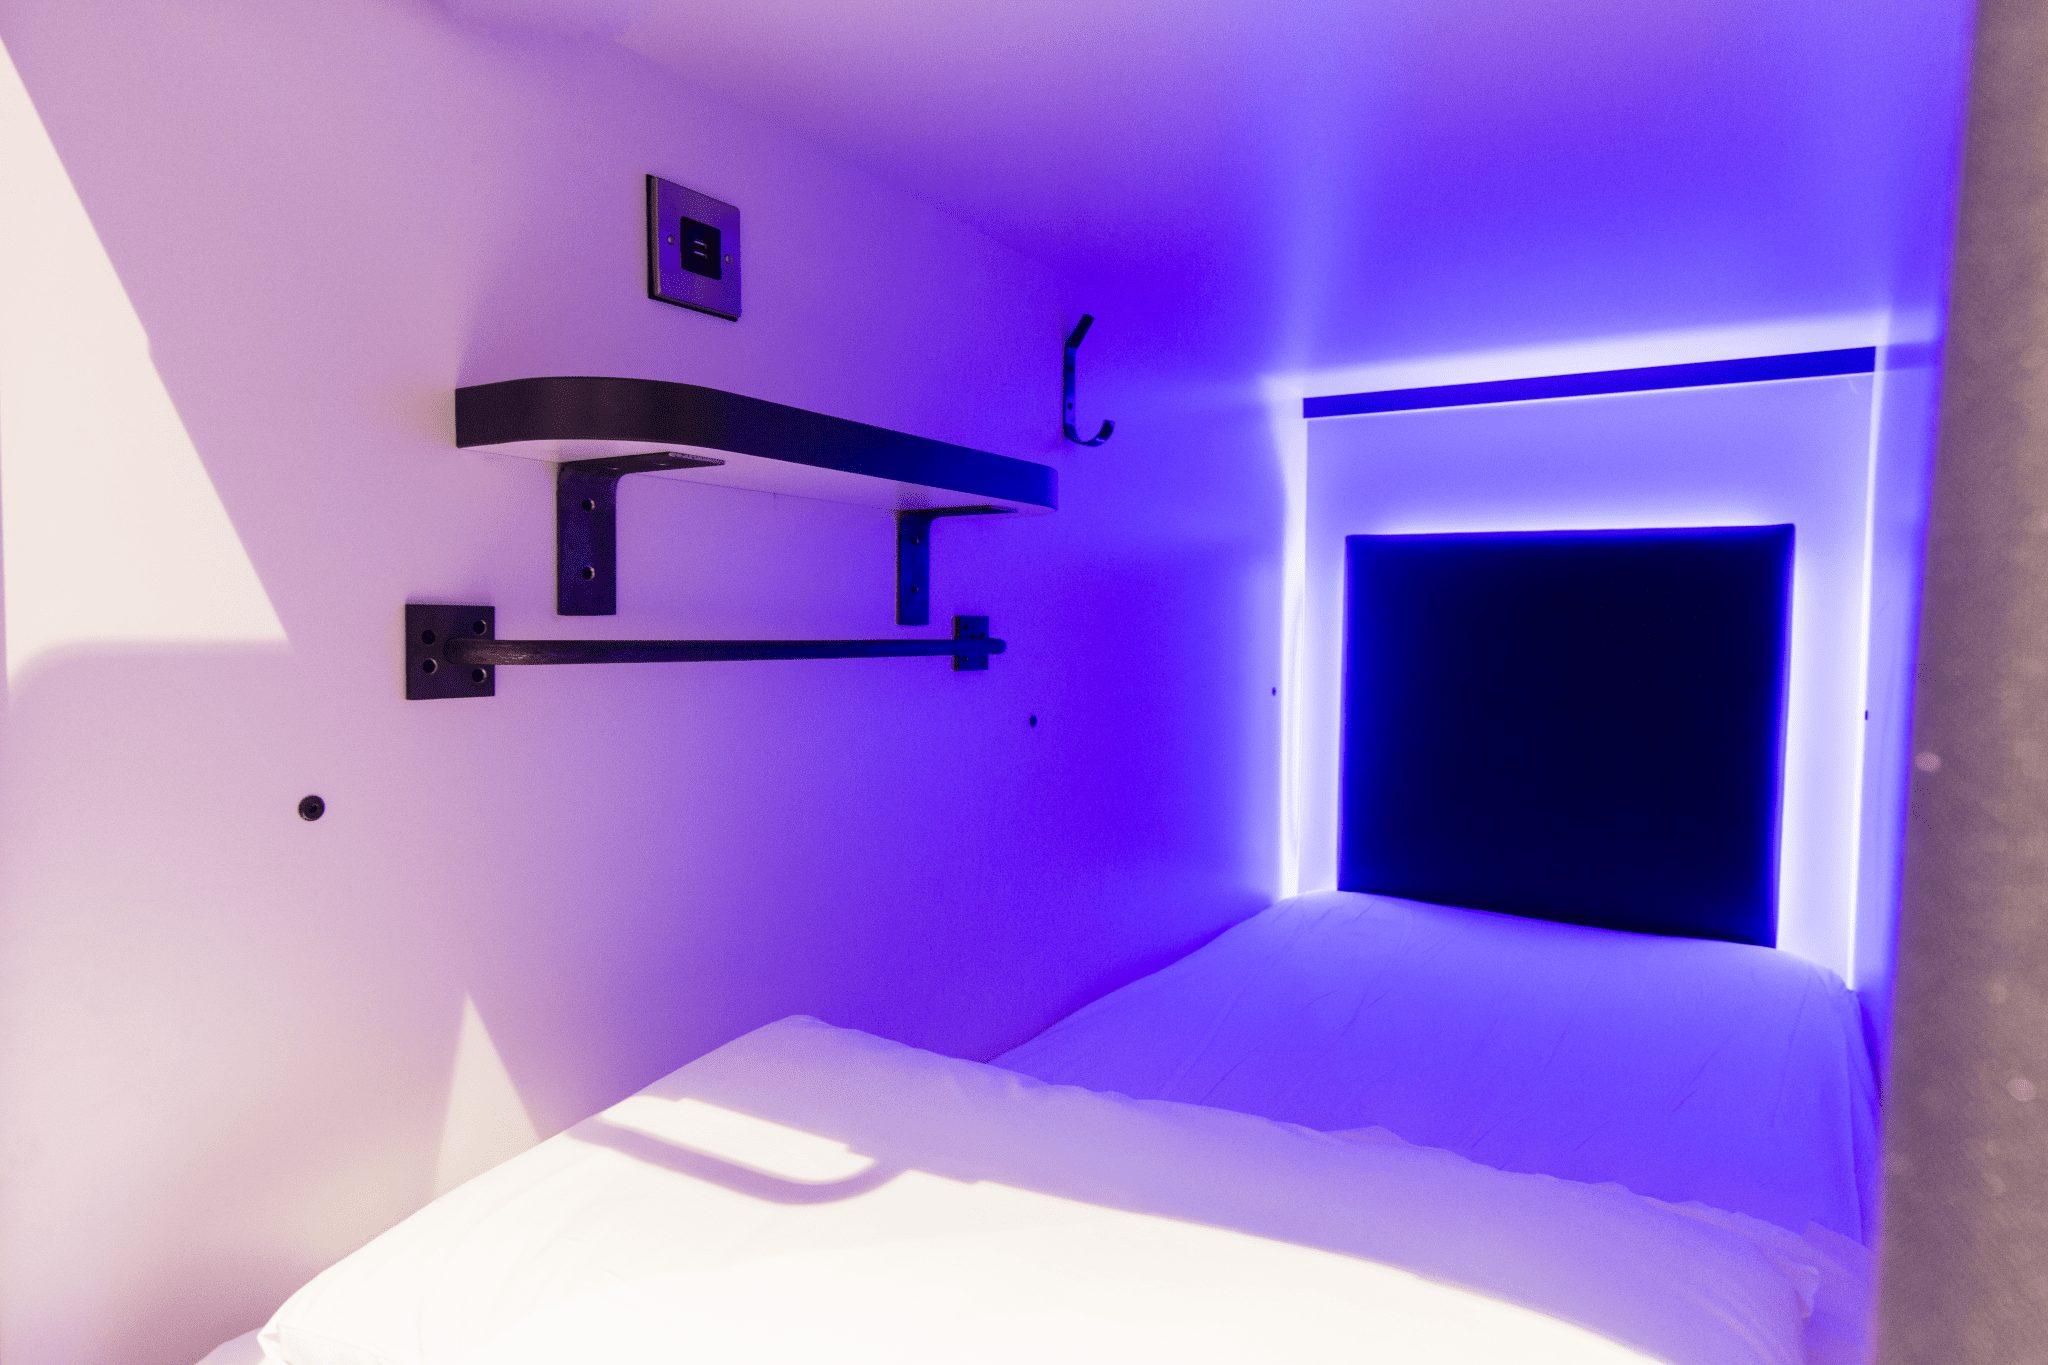 code pod hostel beds, capsule hostel in edinburgh, capsule hostel in dublin